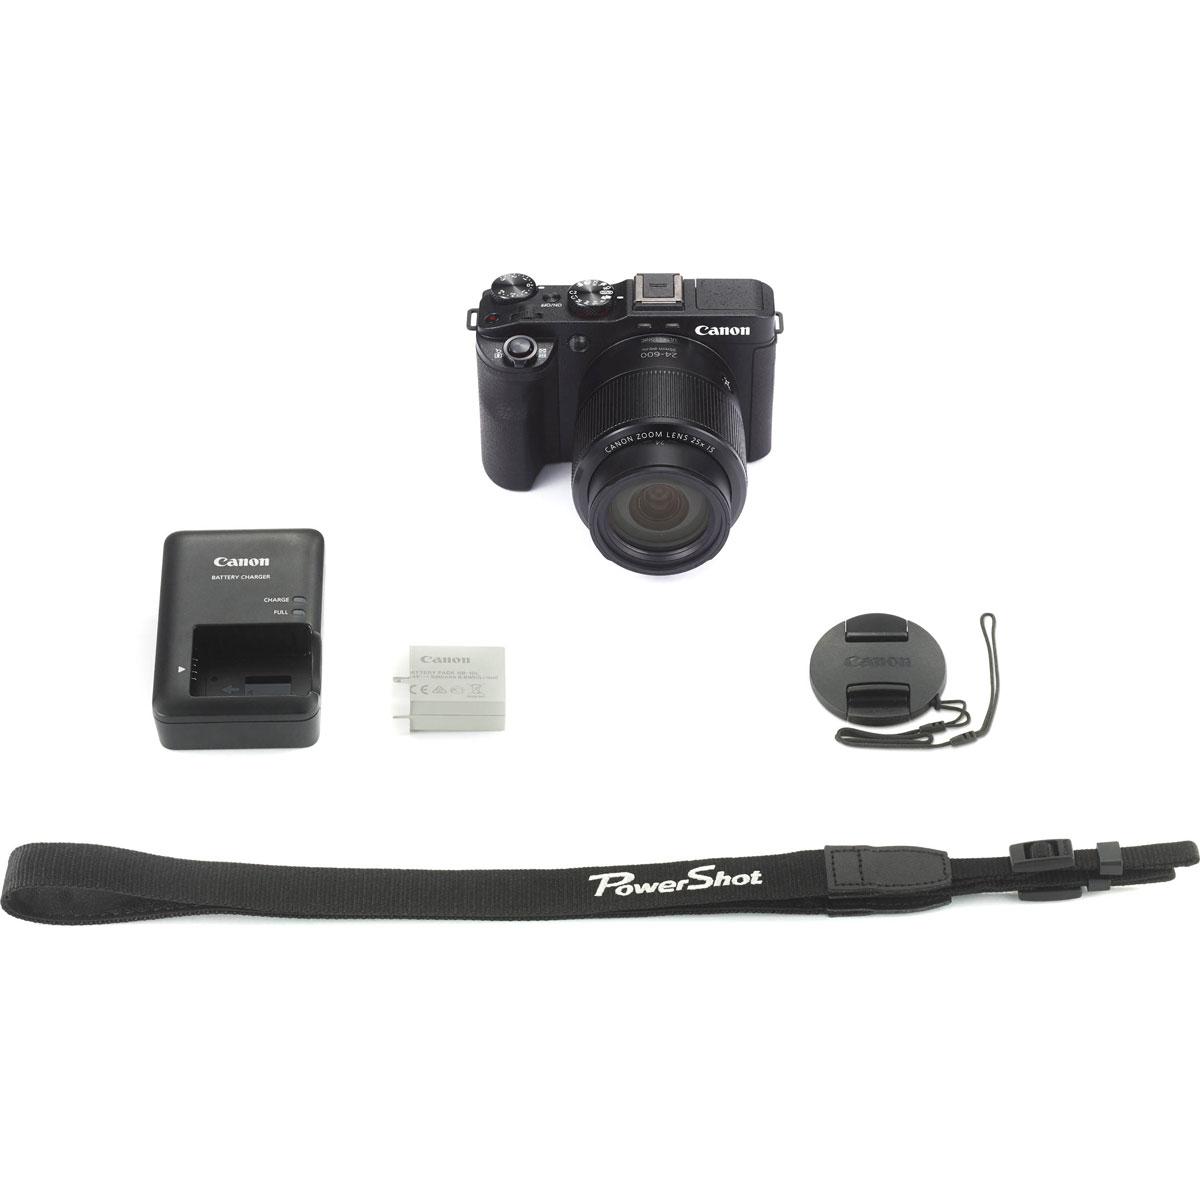 Canon PowerShot G3 X, Black цифровая фотокамера